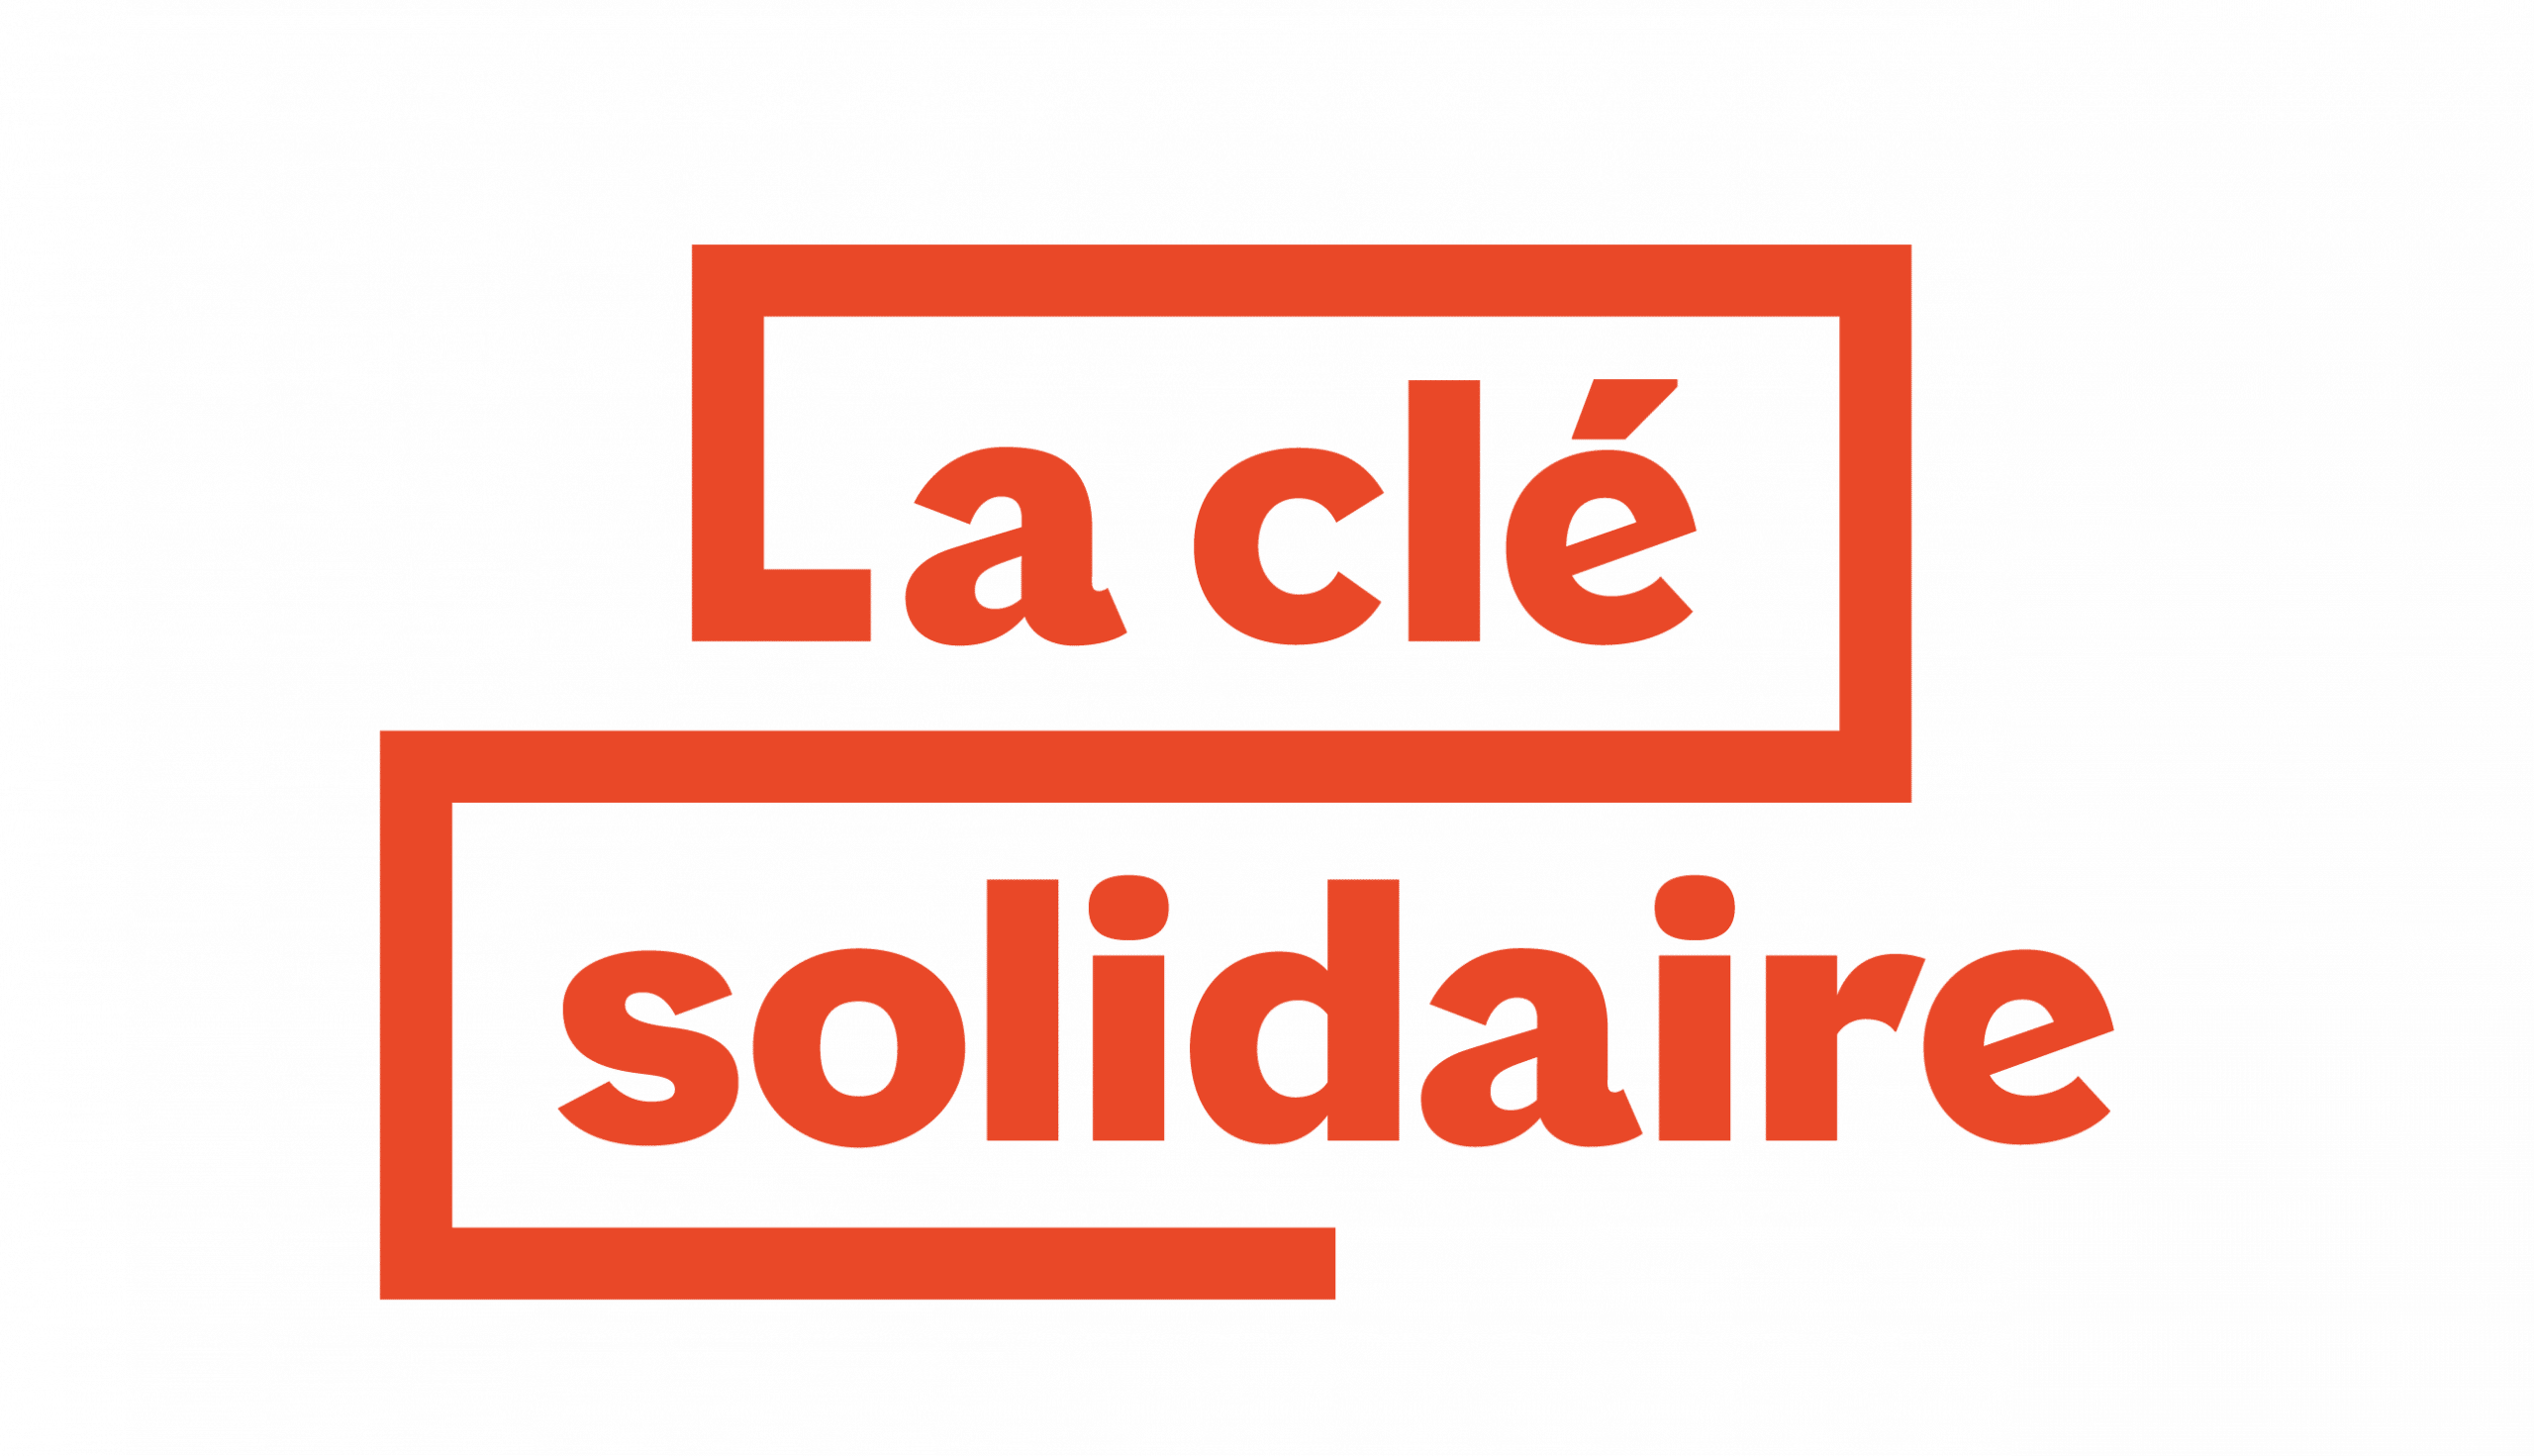 Logo de la La clé solidaire en format png